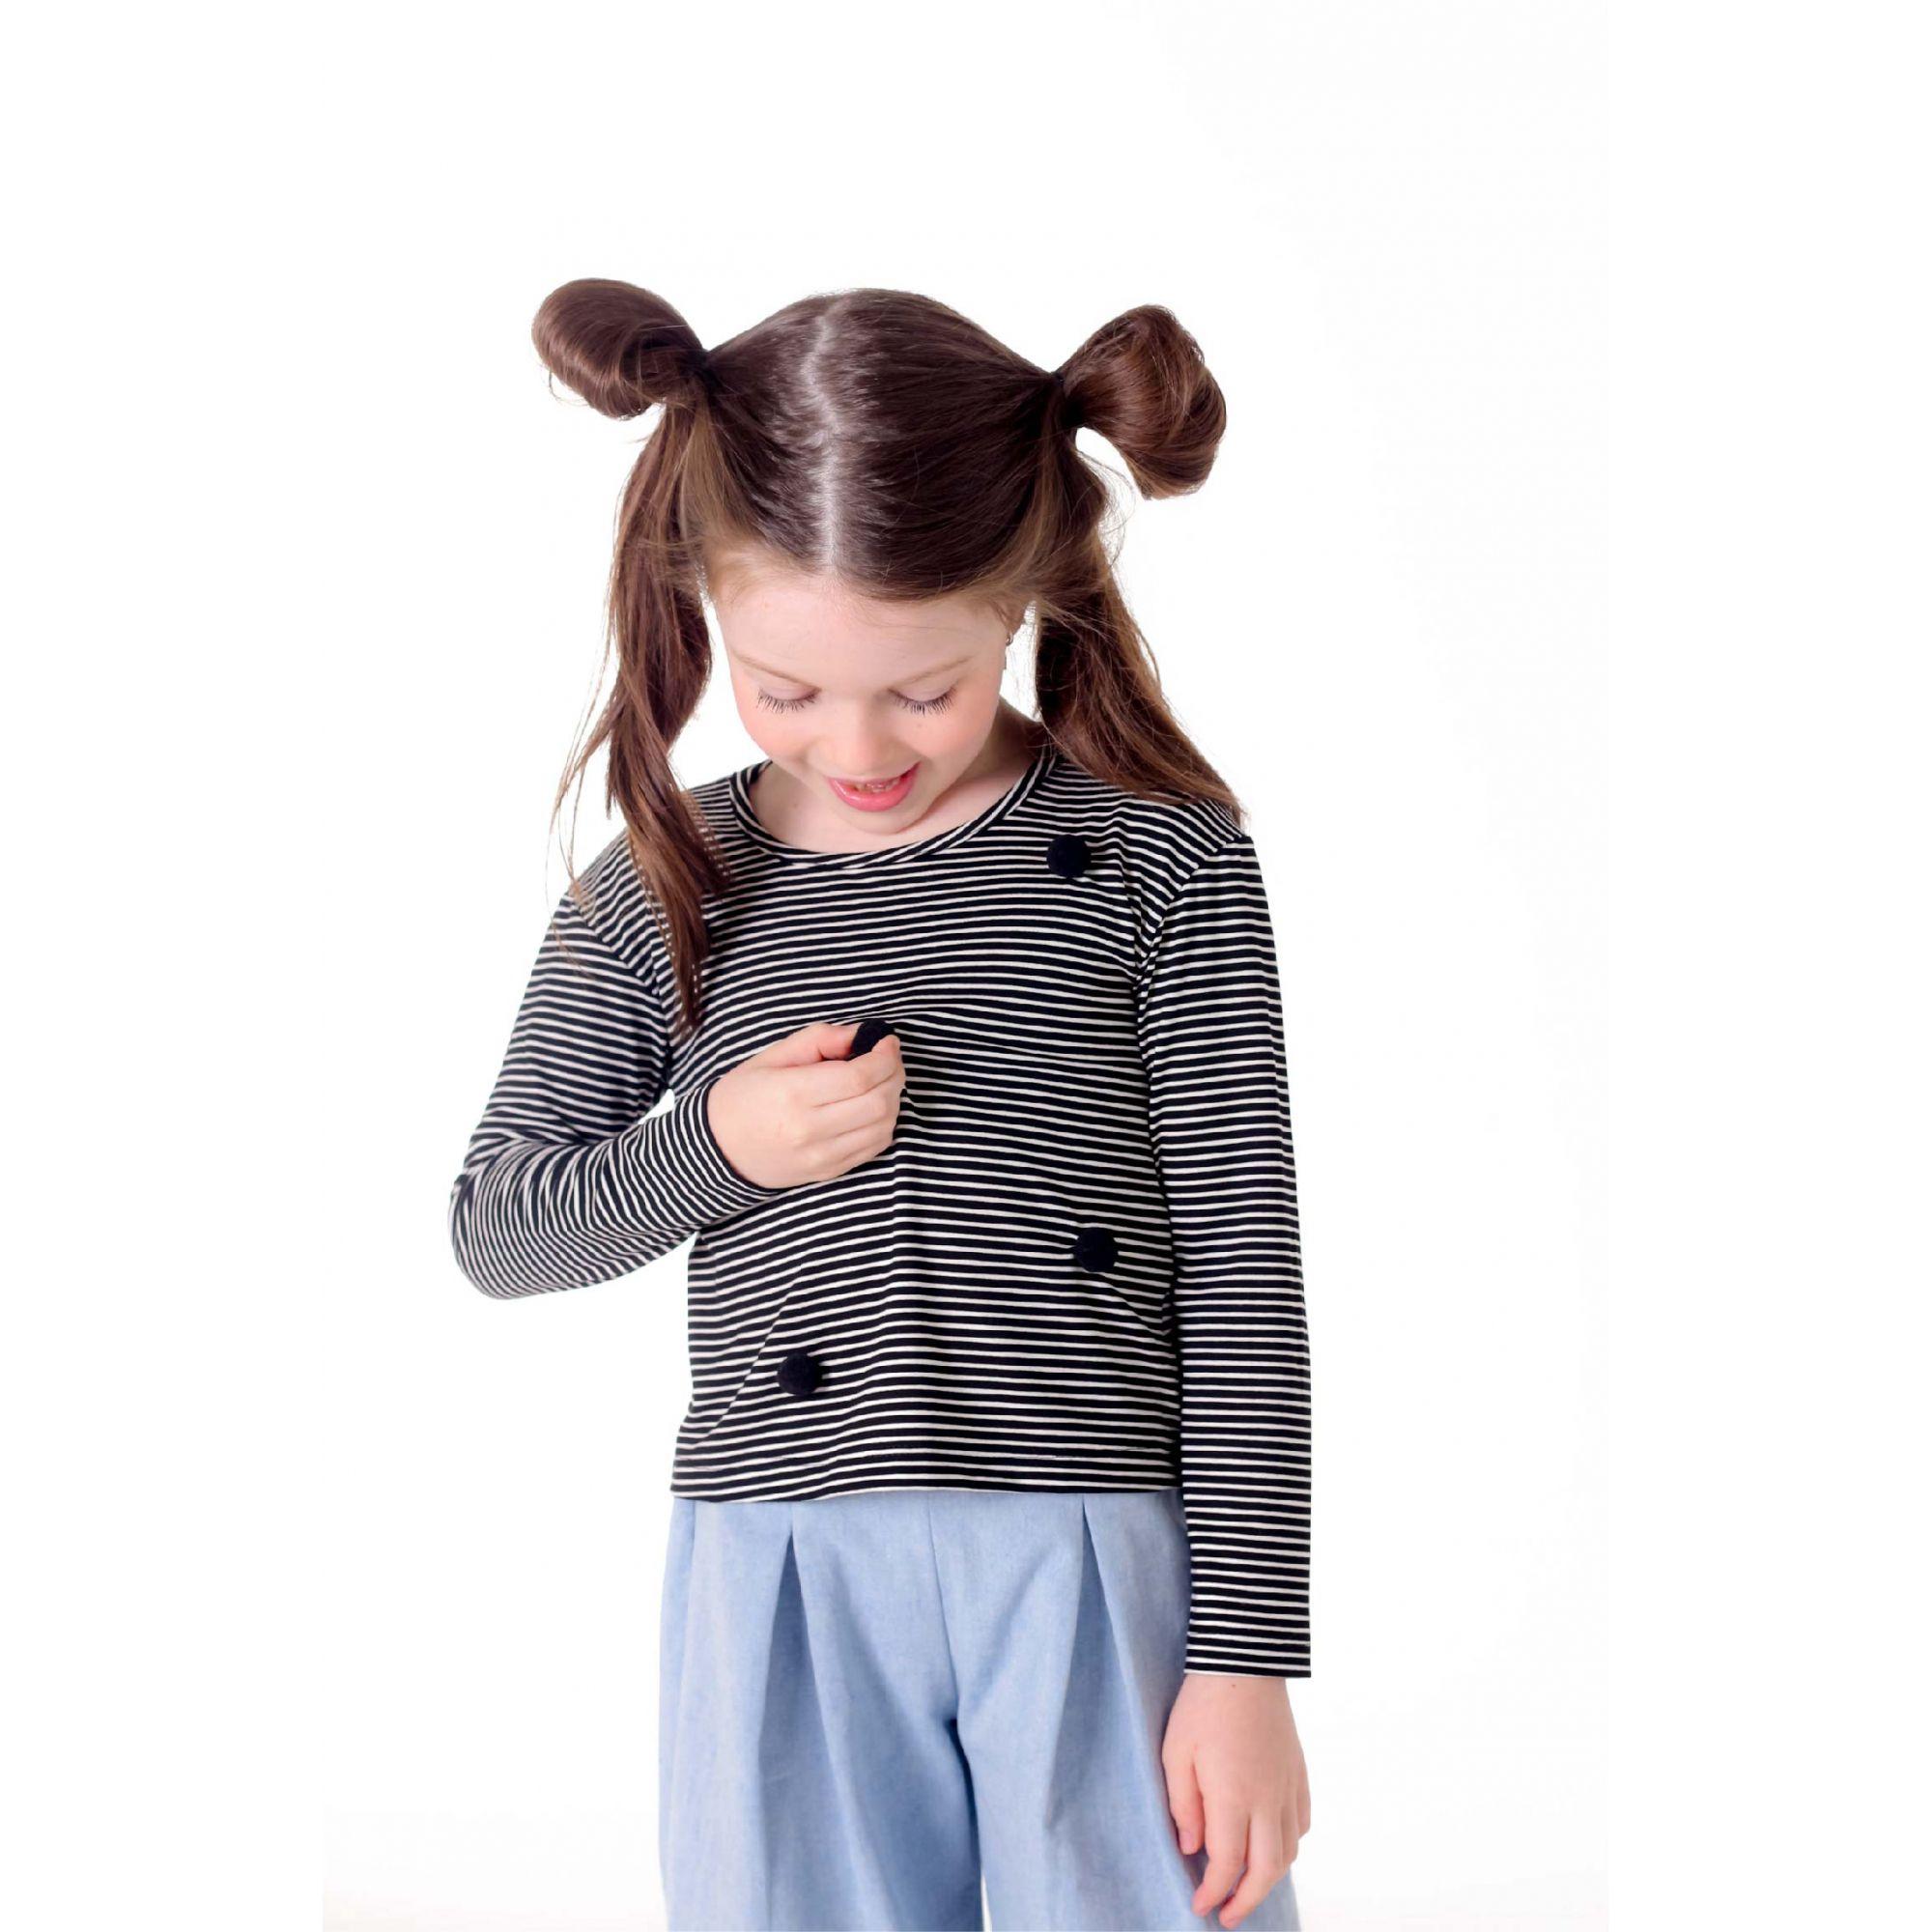 Blusa Manga Longa Viscolycra Listrada Pompons